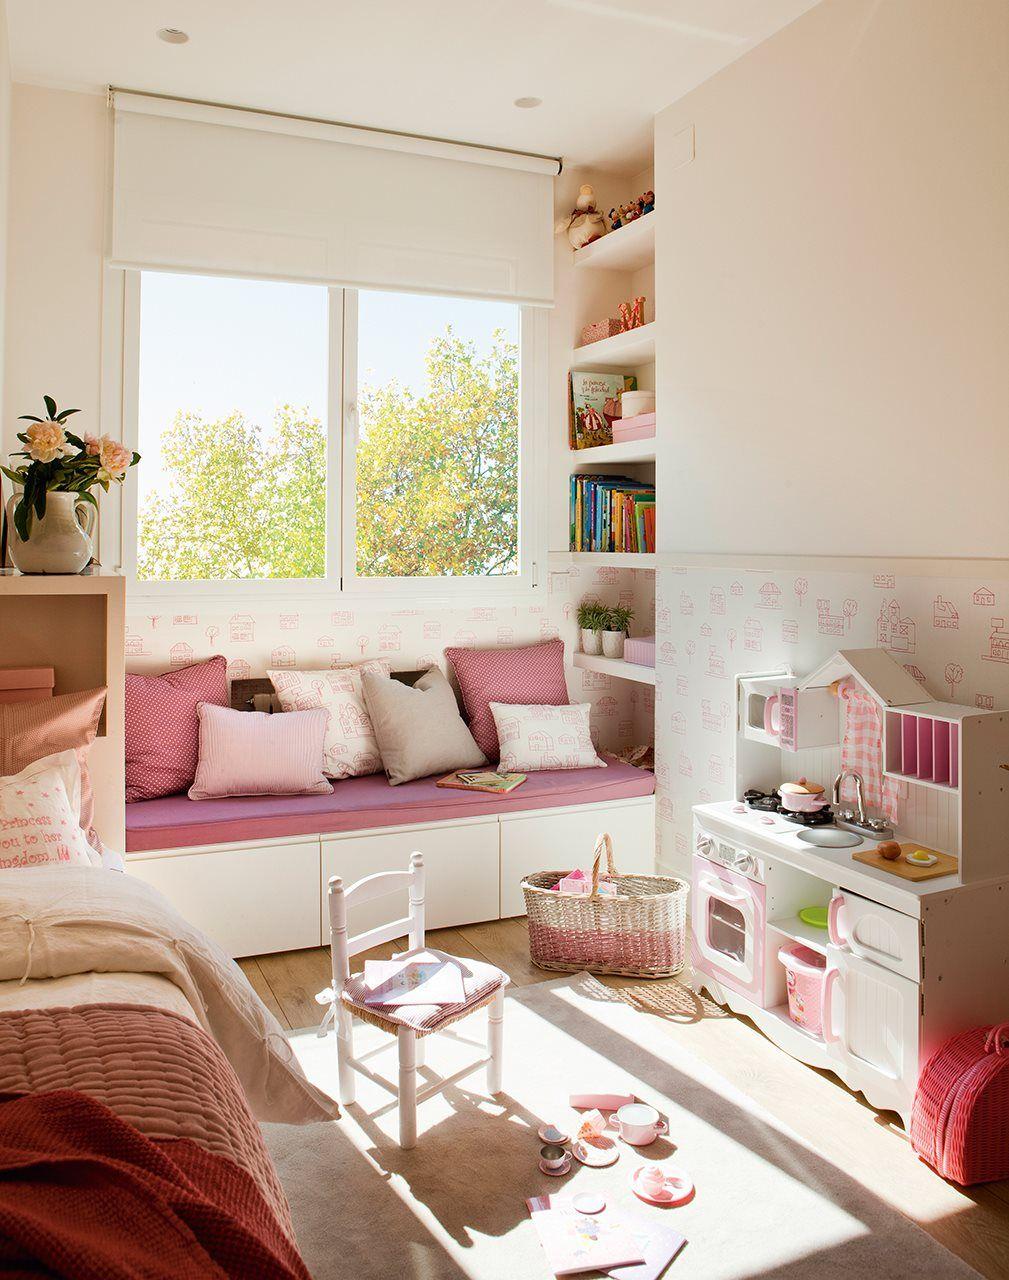 Dormitorio infantil en rosa aprovechar el espacio - Aprovechar espacio dormitorio ...